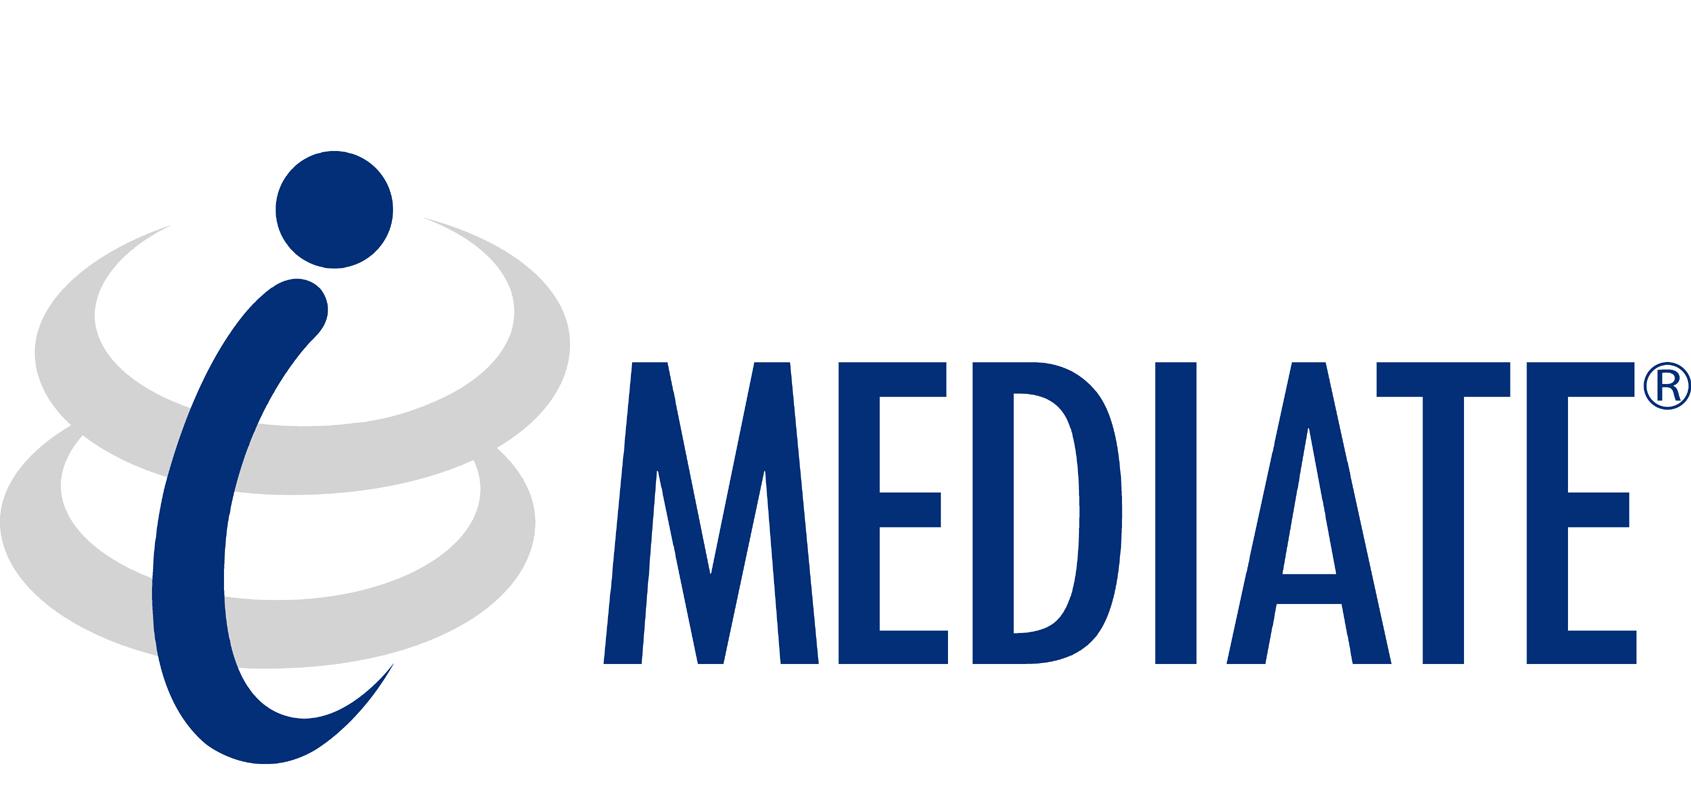 iMediate Inc - Family Mediation Florida www.iChatMediation.com